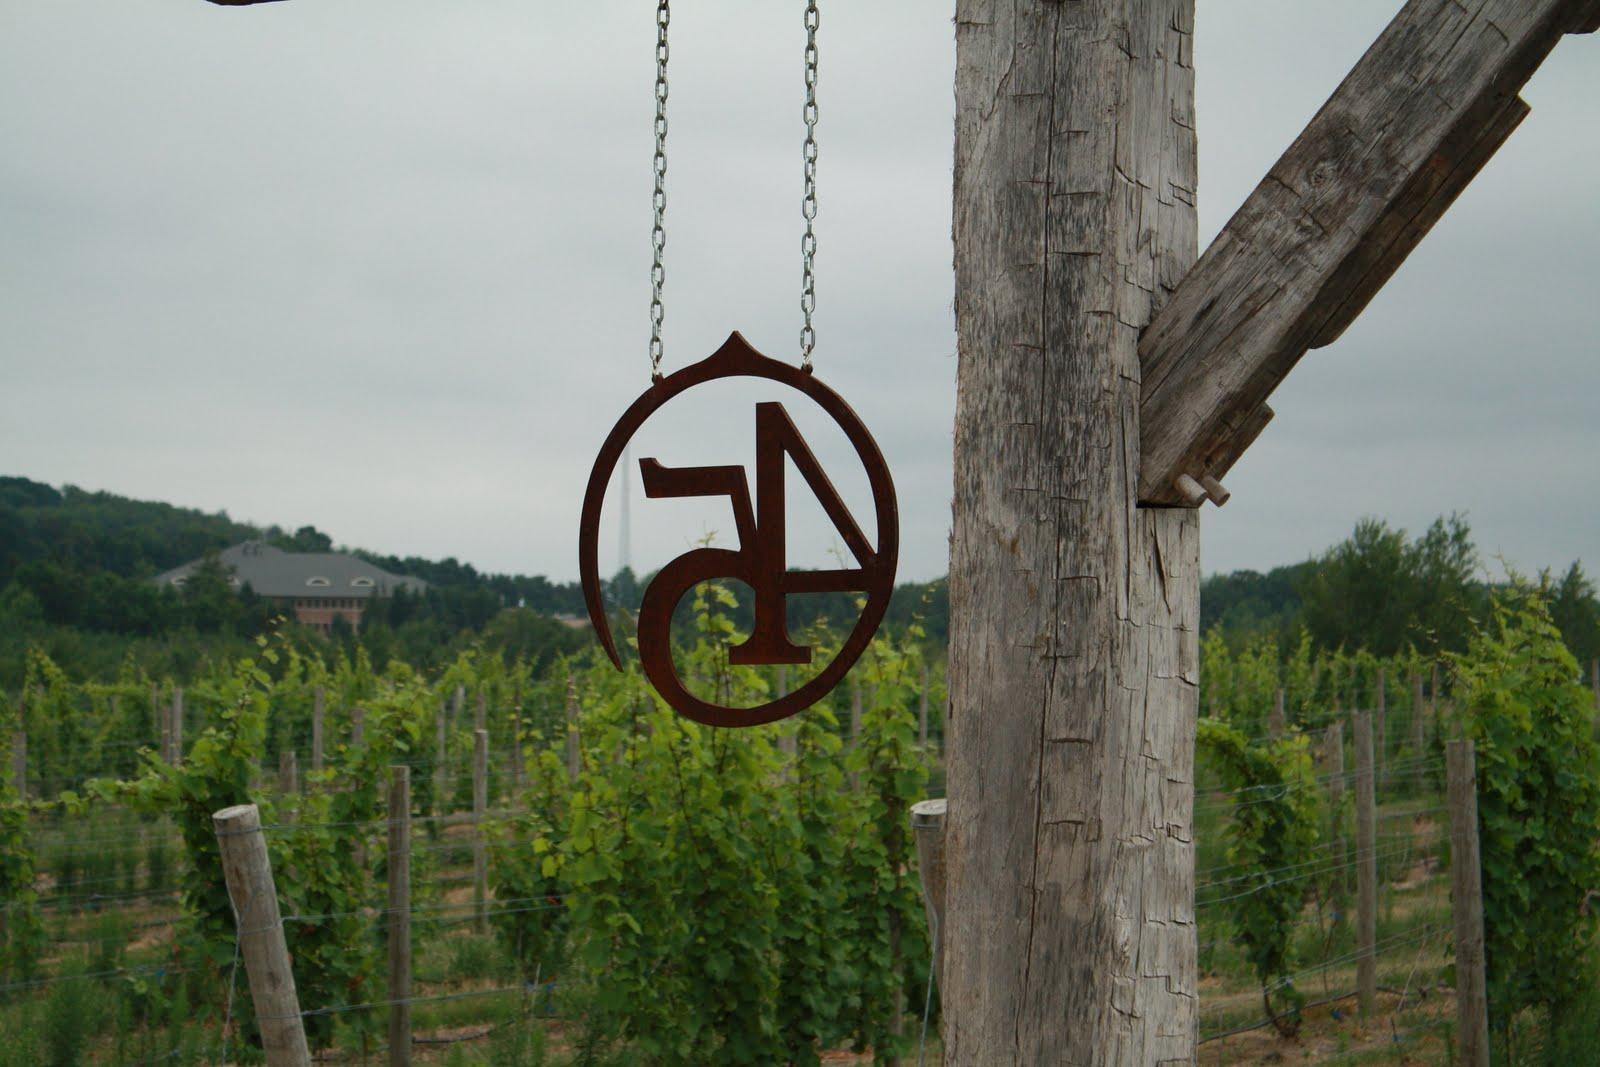 45 North Winery